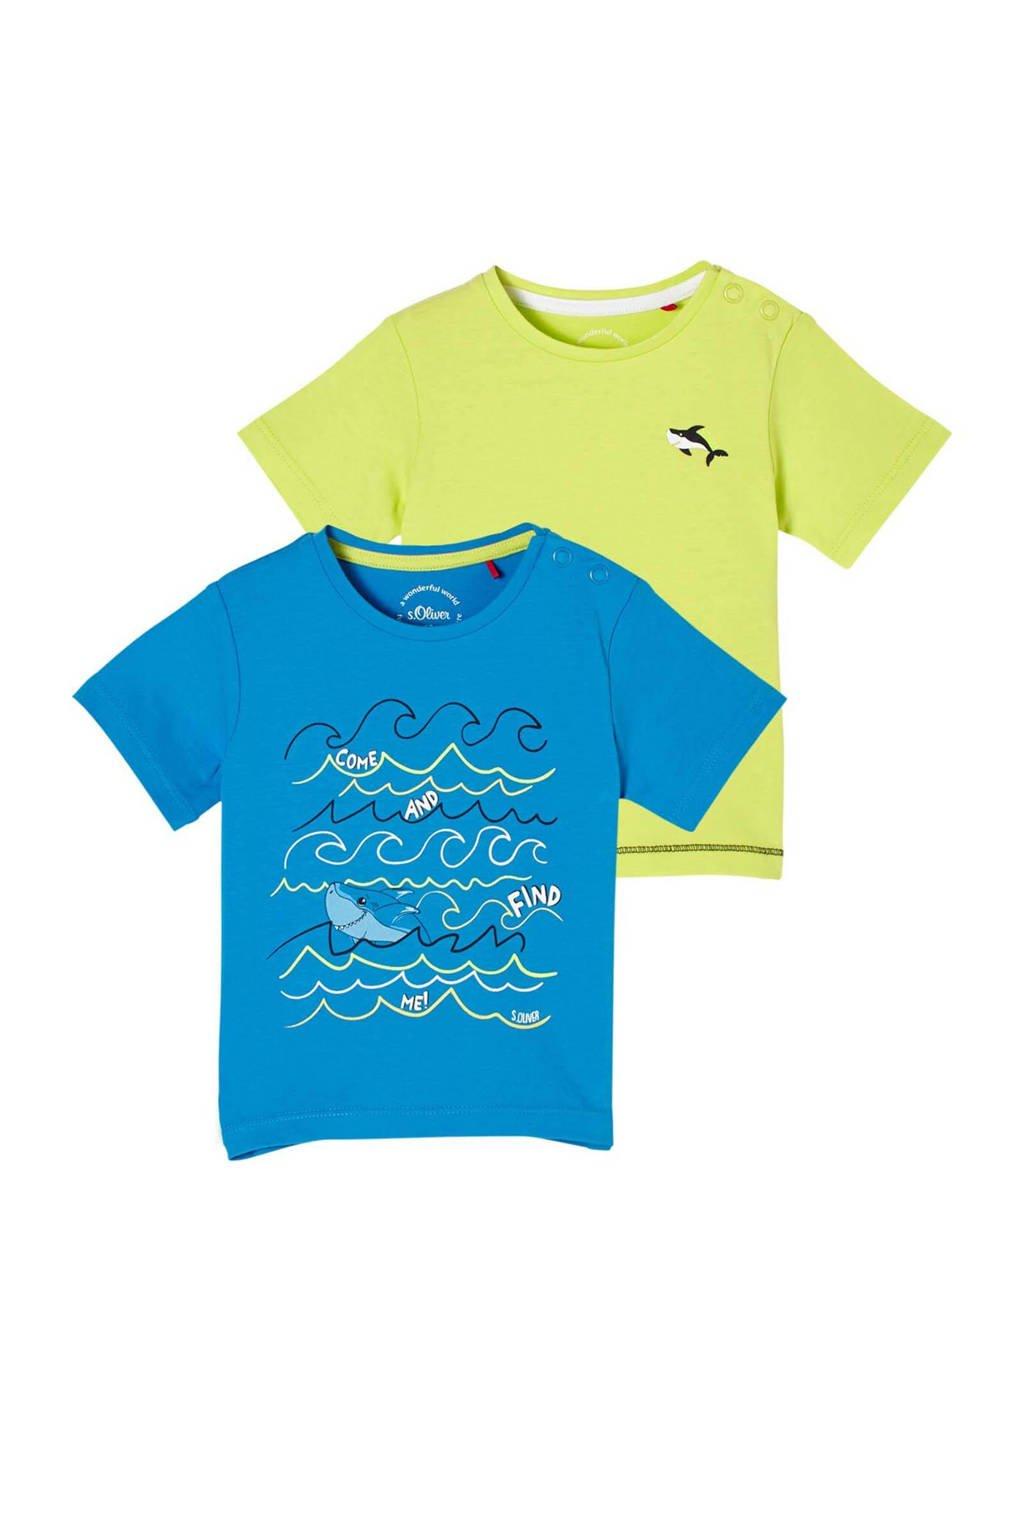 s.Oliver T-shirt - set van 2 multi color, Multi